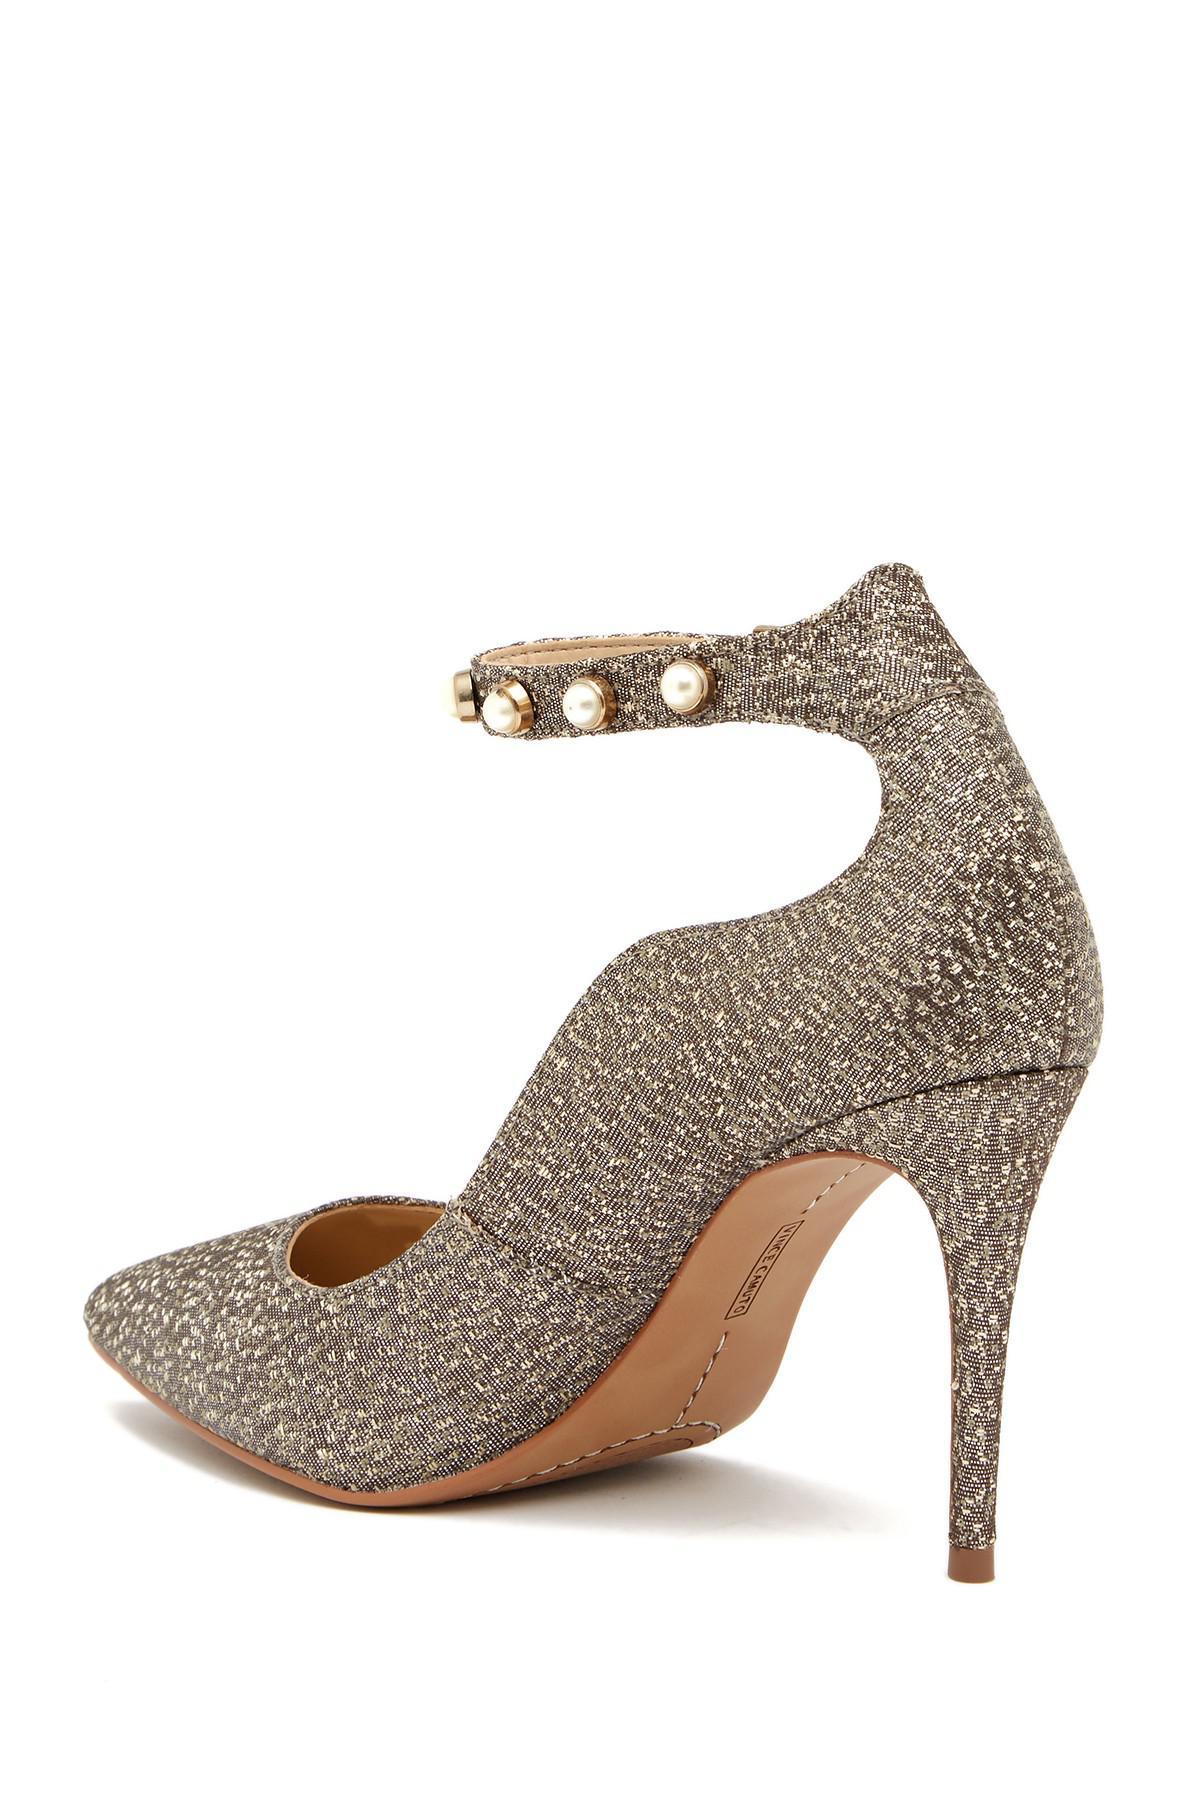 Vince Camuto Jassita Glitter Pearl Ankle Strap Pumps yGssQeO